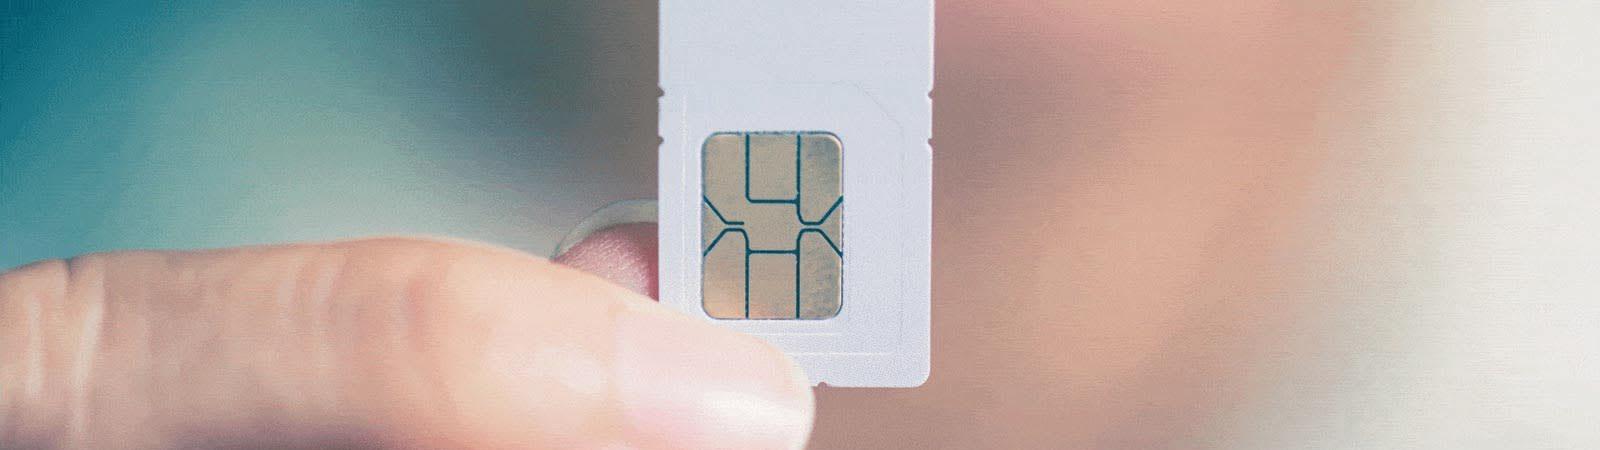 Regular-SIM-cards-vs-IoT-SIM-cards__2_